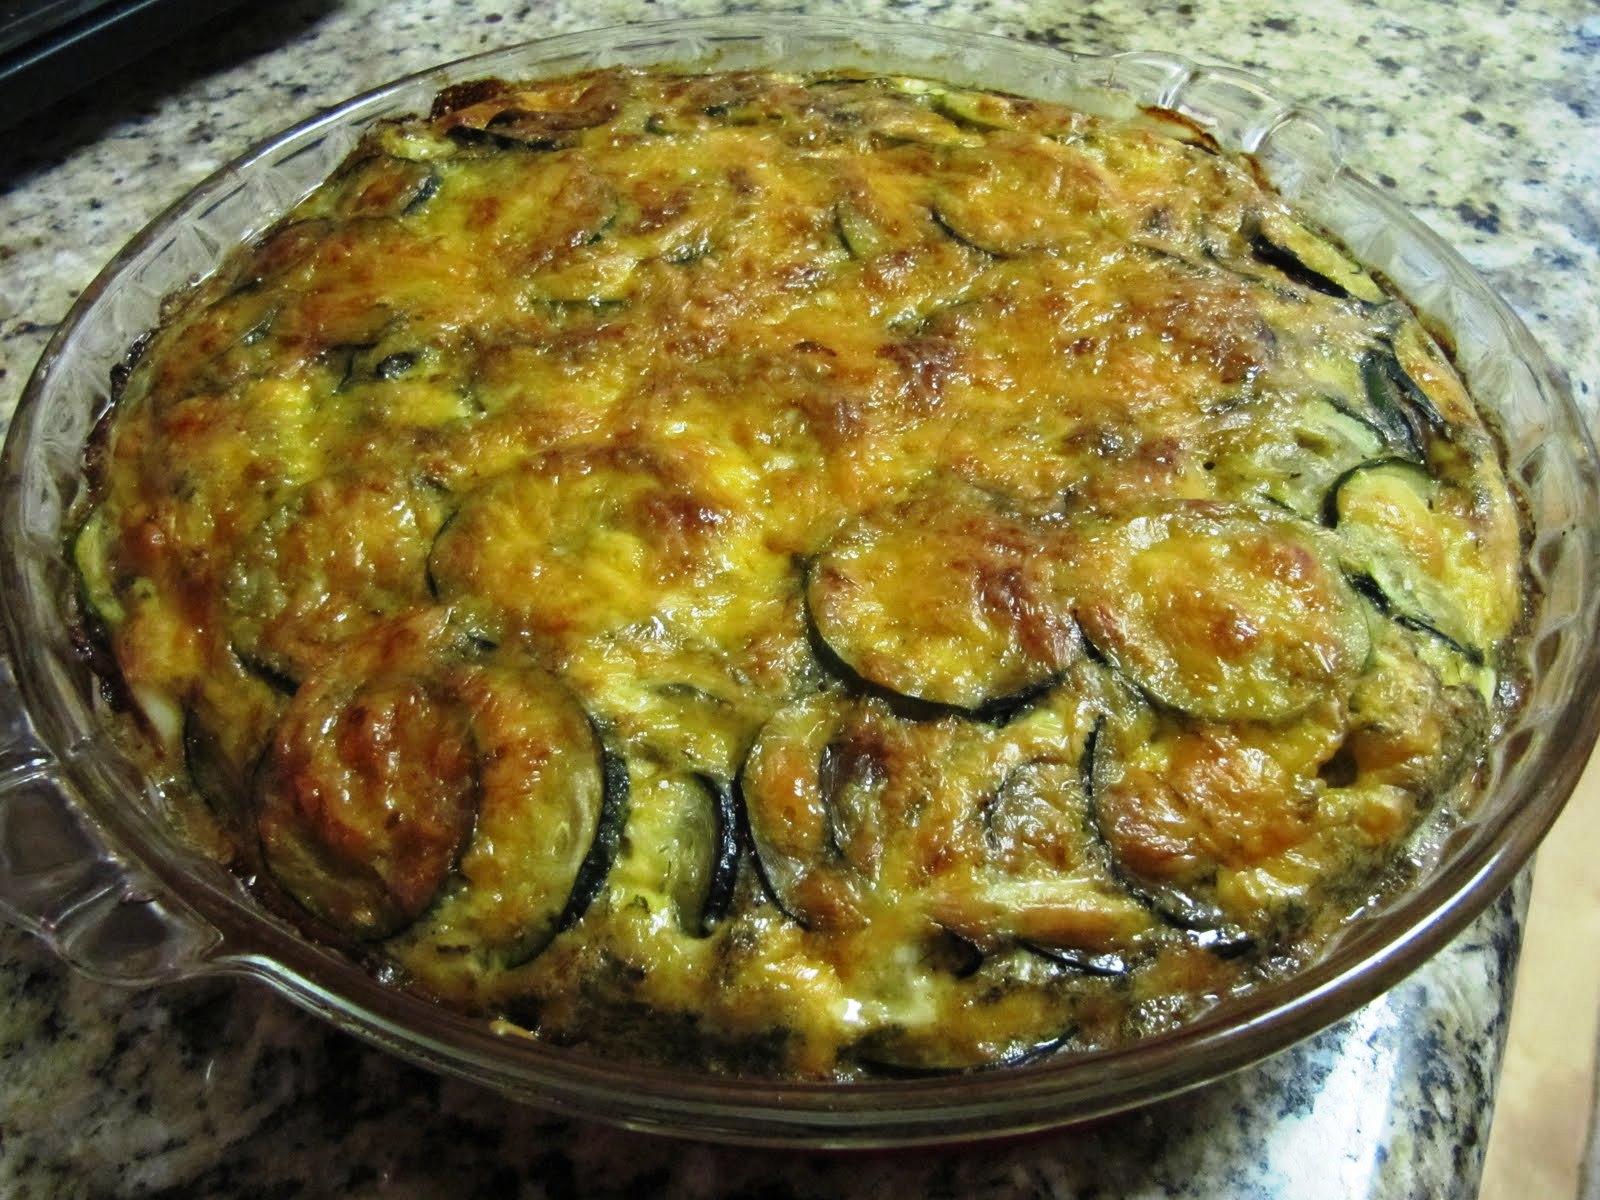 common ingredient cooking crustless zucchini quiche